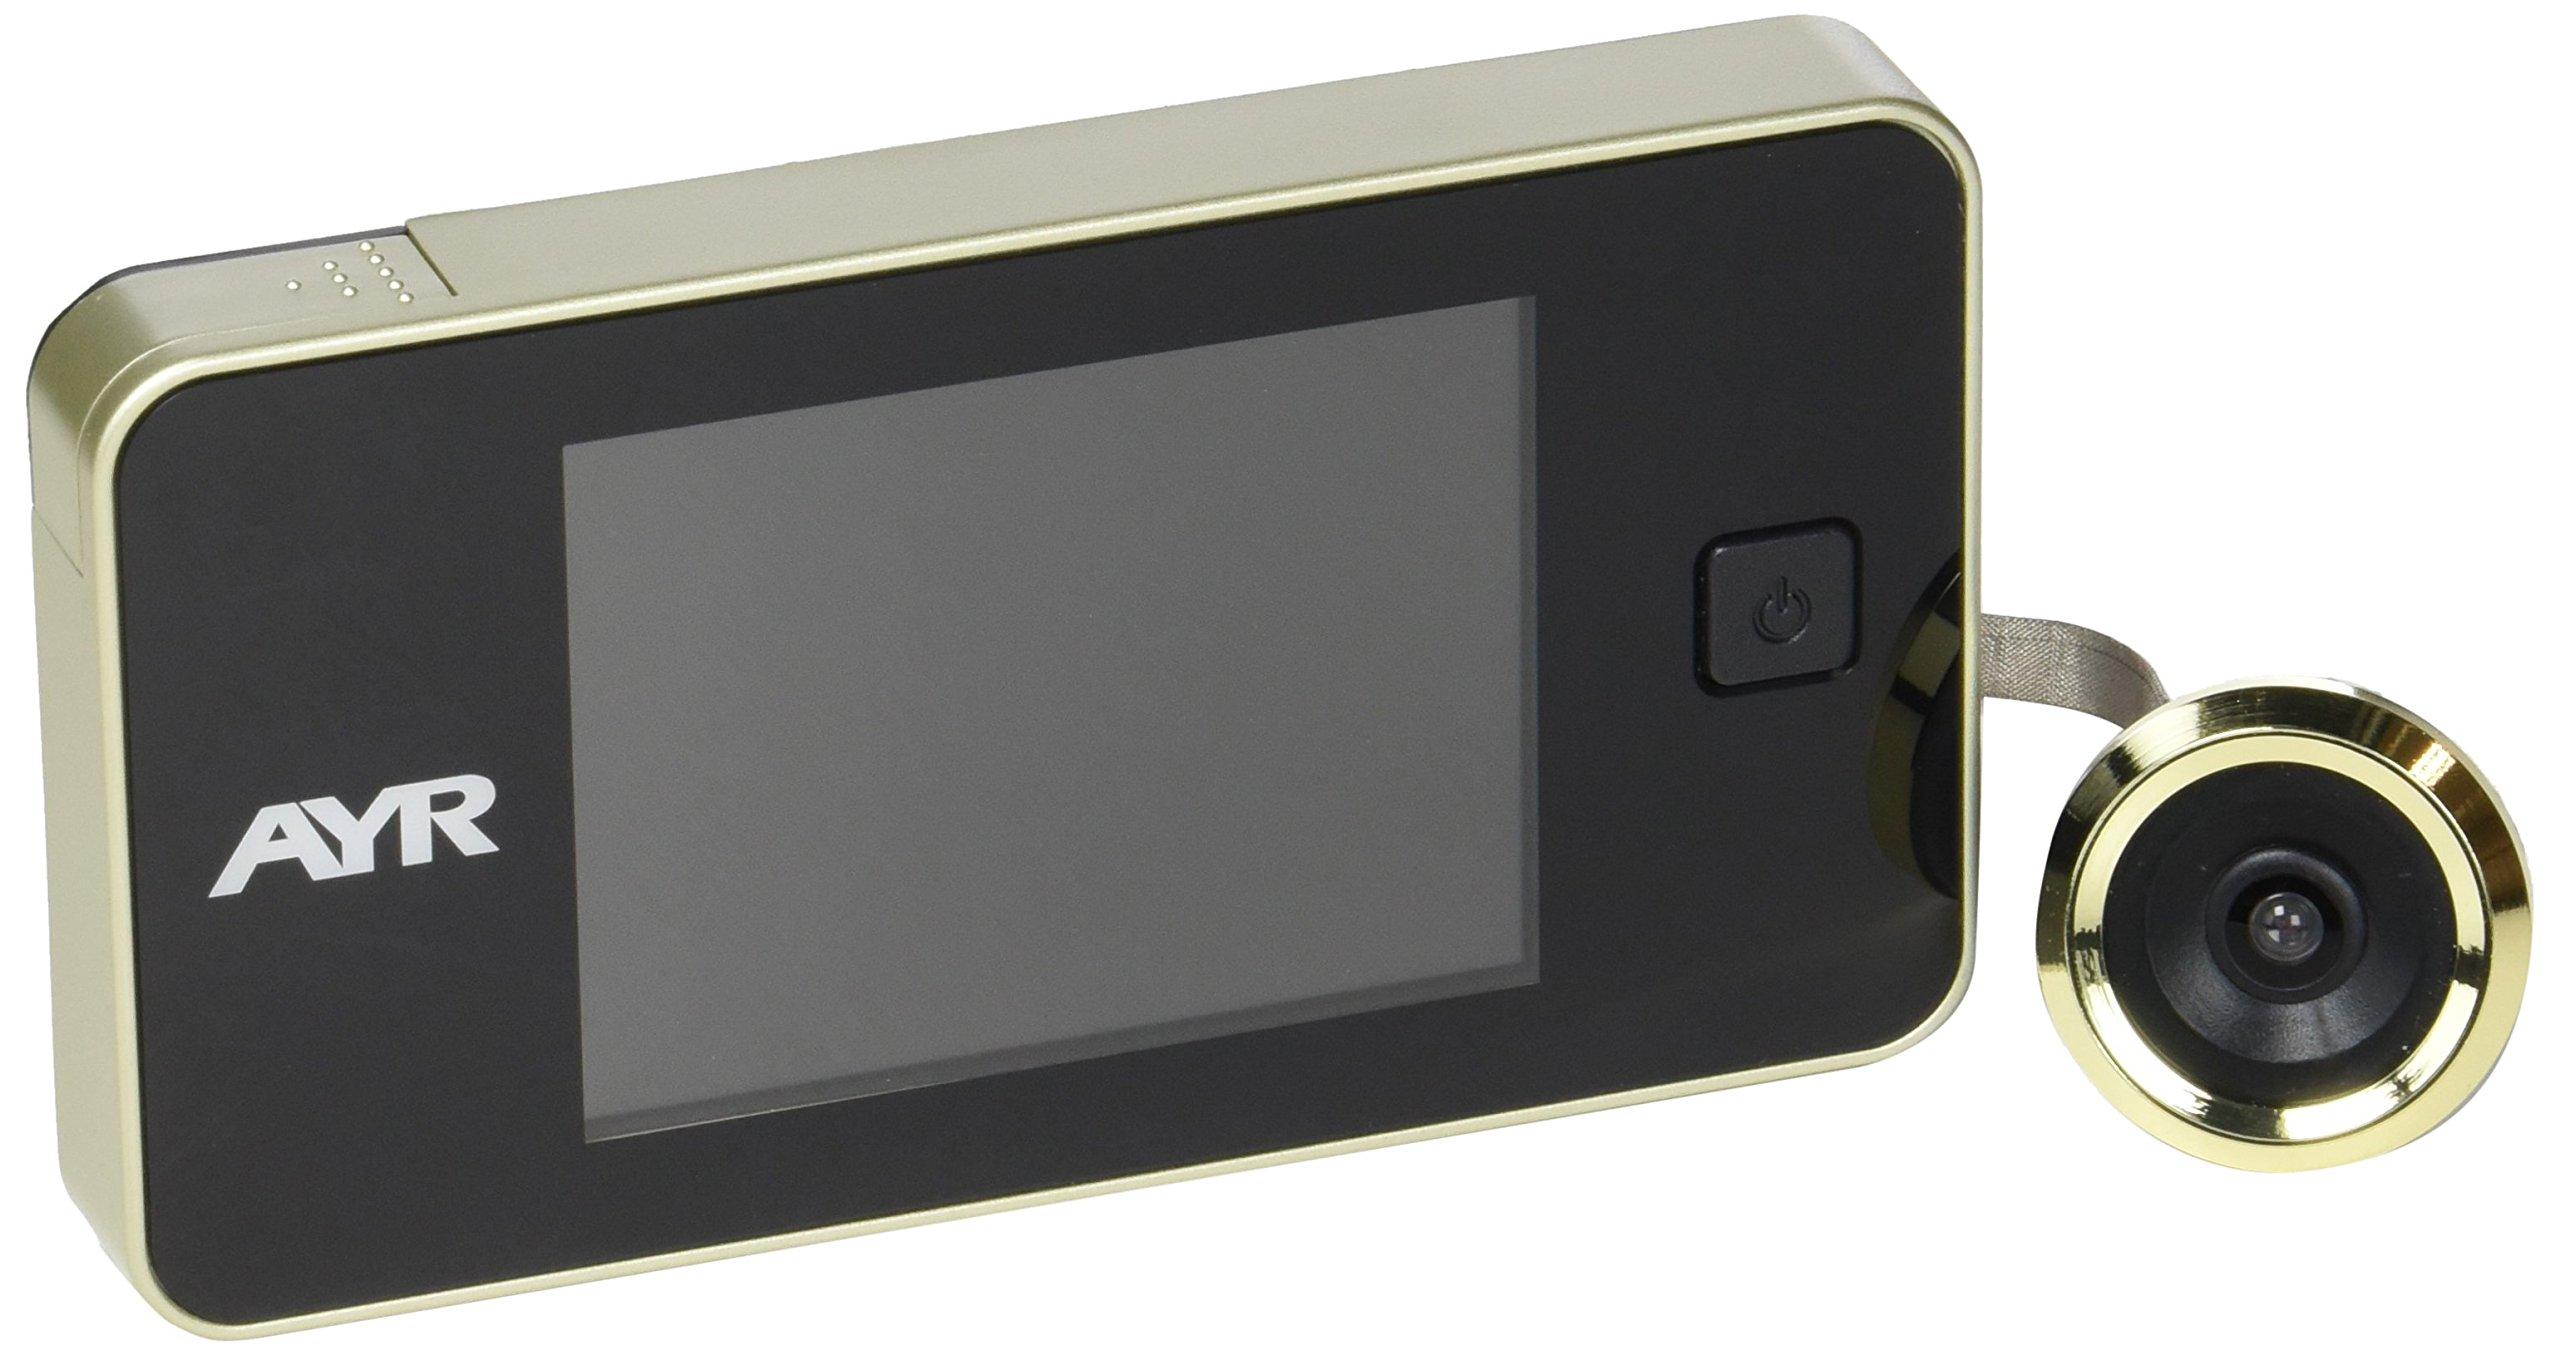 AYR 752, Mirilla digital de puerta, 125 x 68 x 15 mm